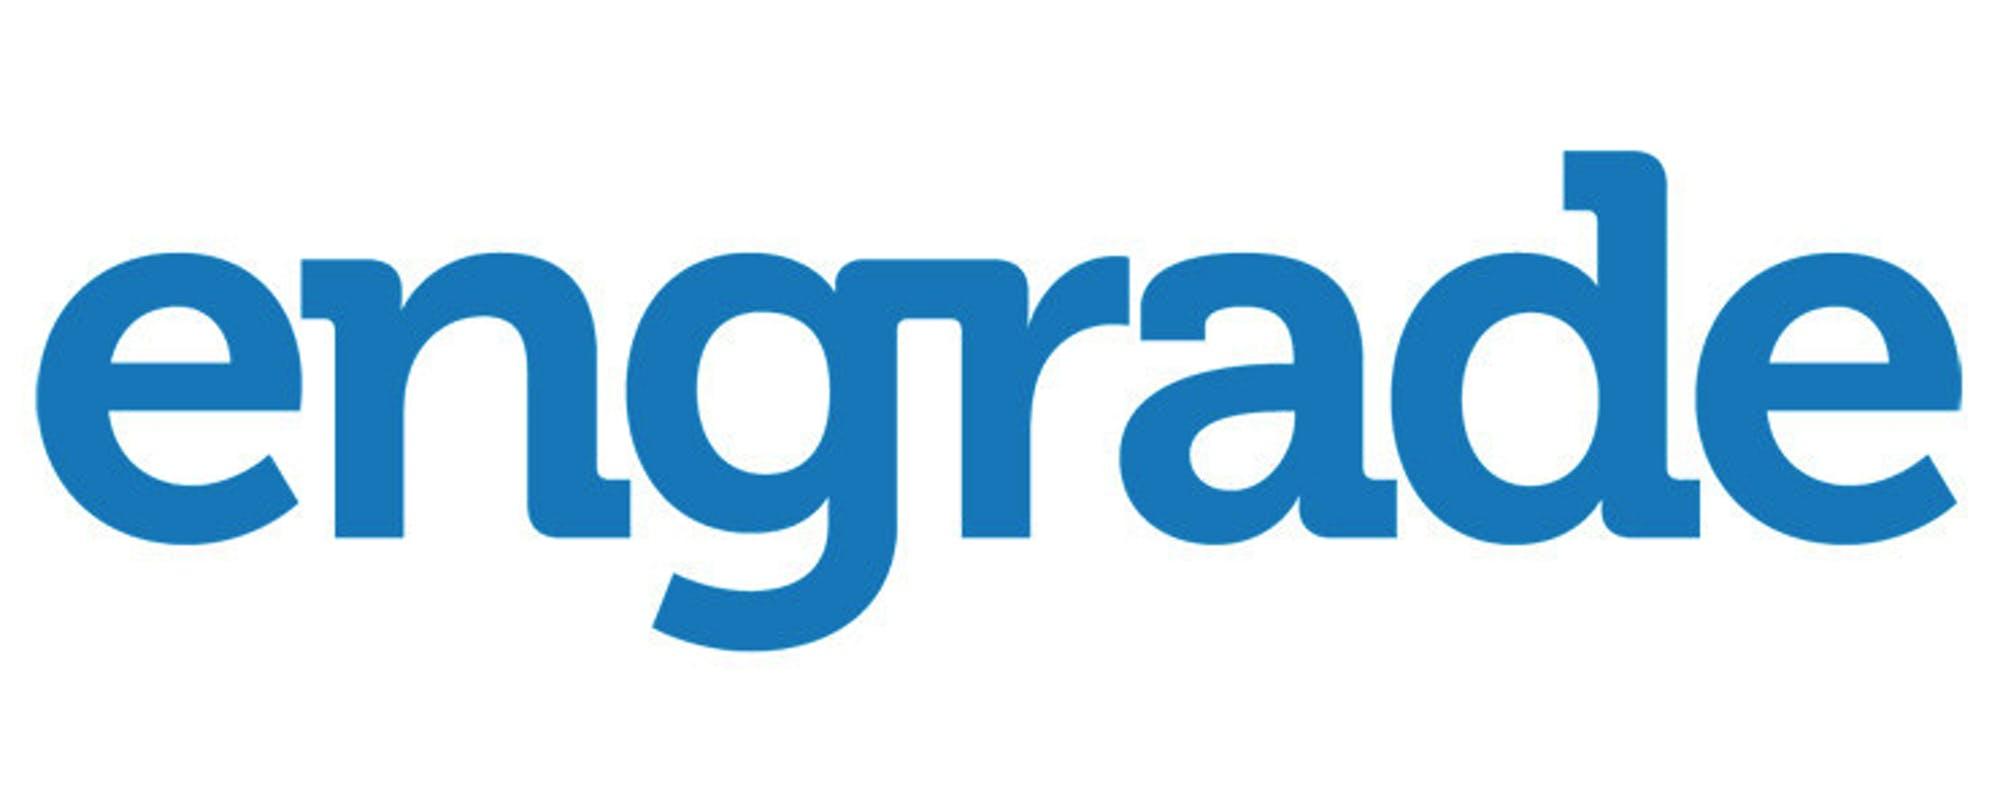 More Than a Gradebook: Engrade Raises $5M Series B